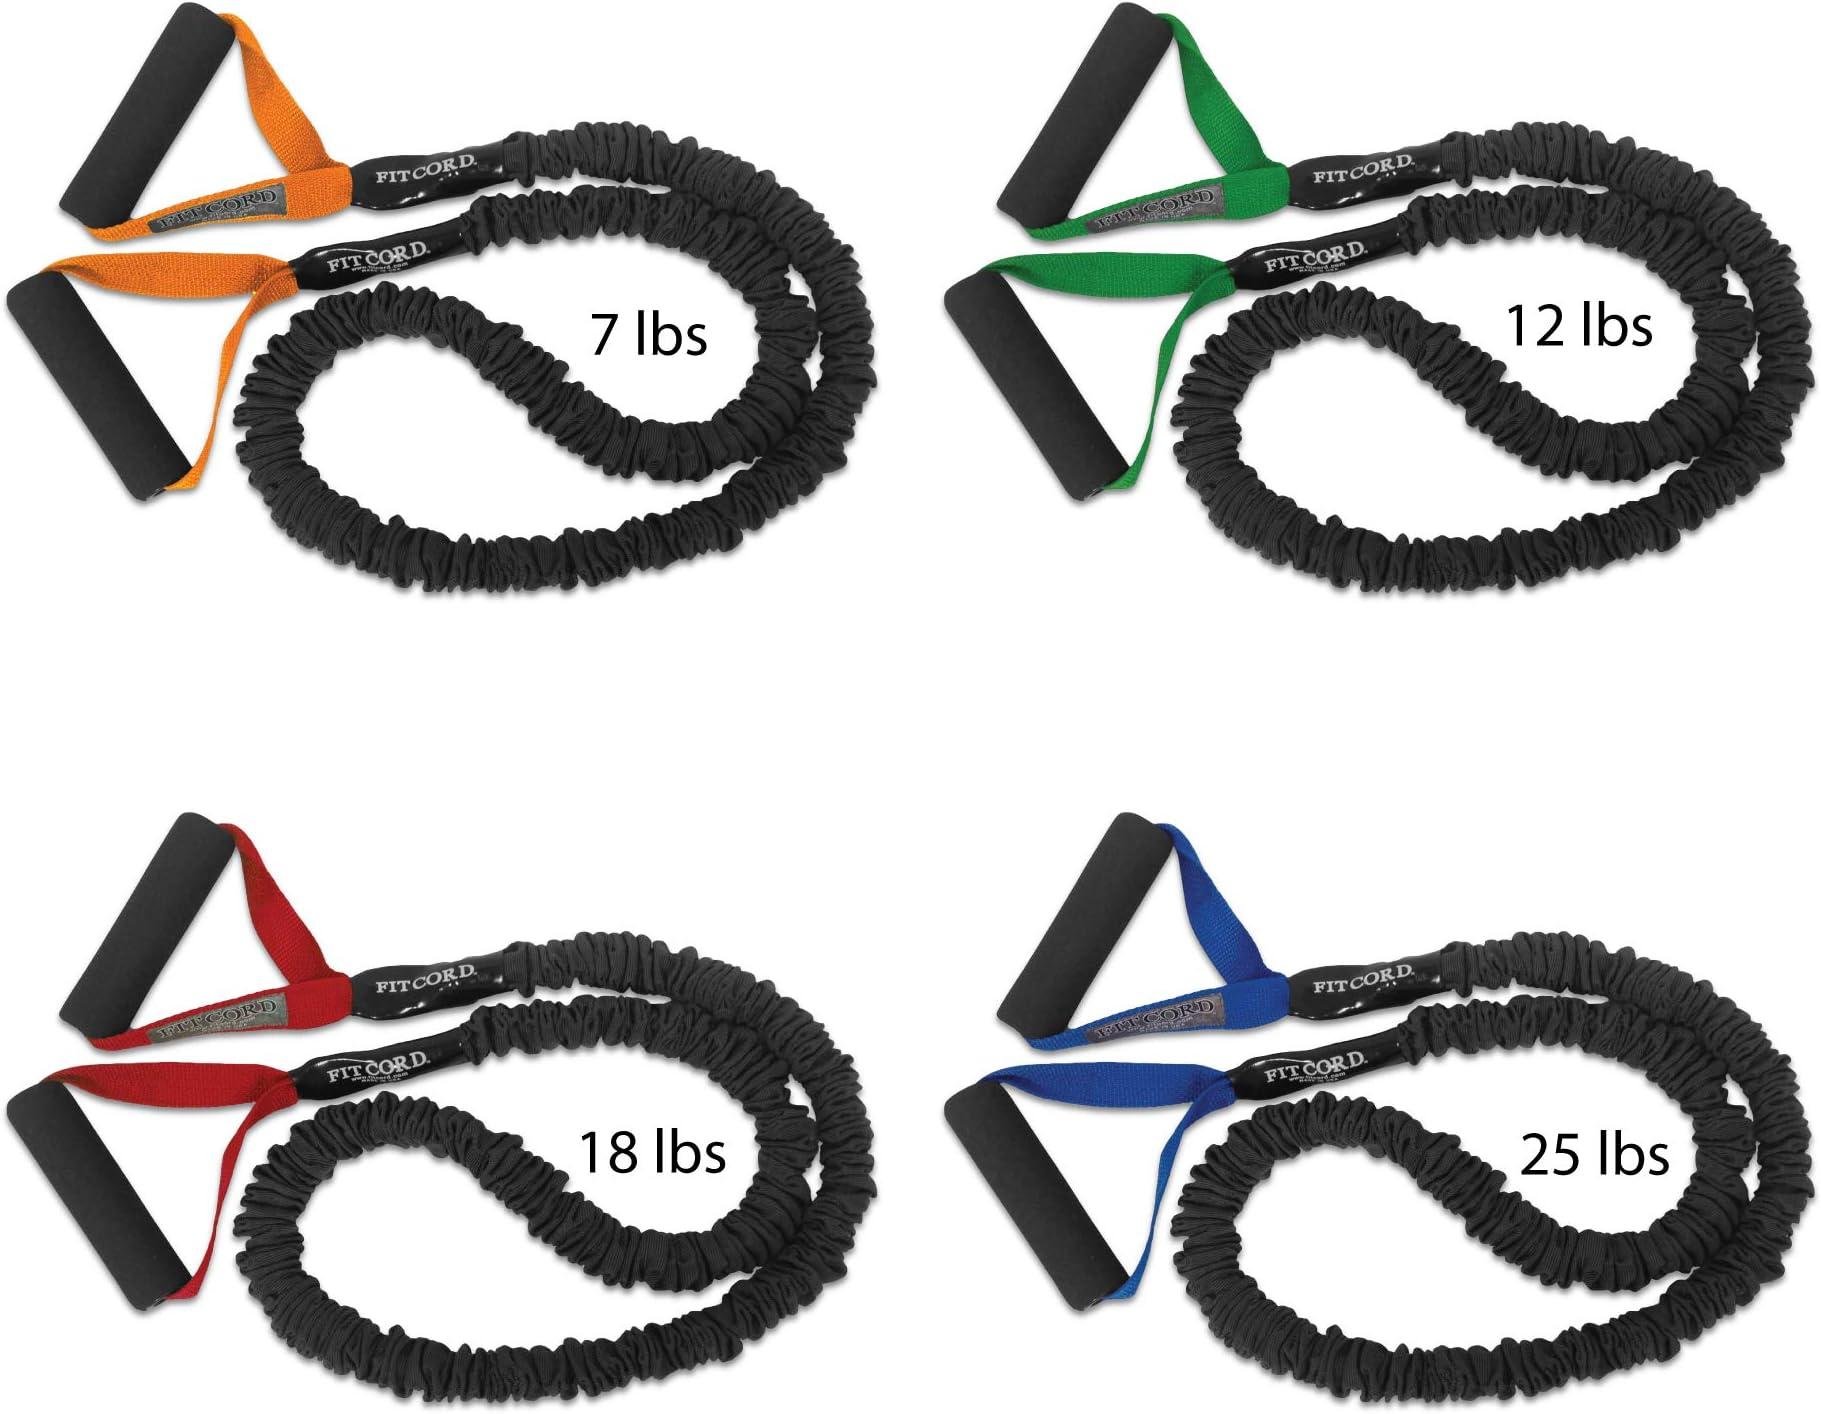 Nylon sleeve resistance tubing with handles for strengthening pilates yoga